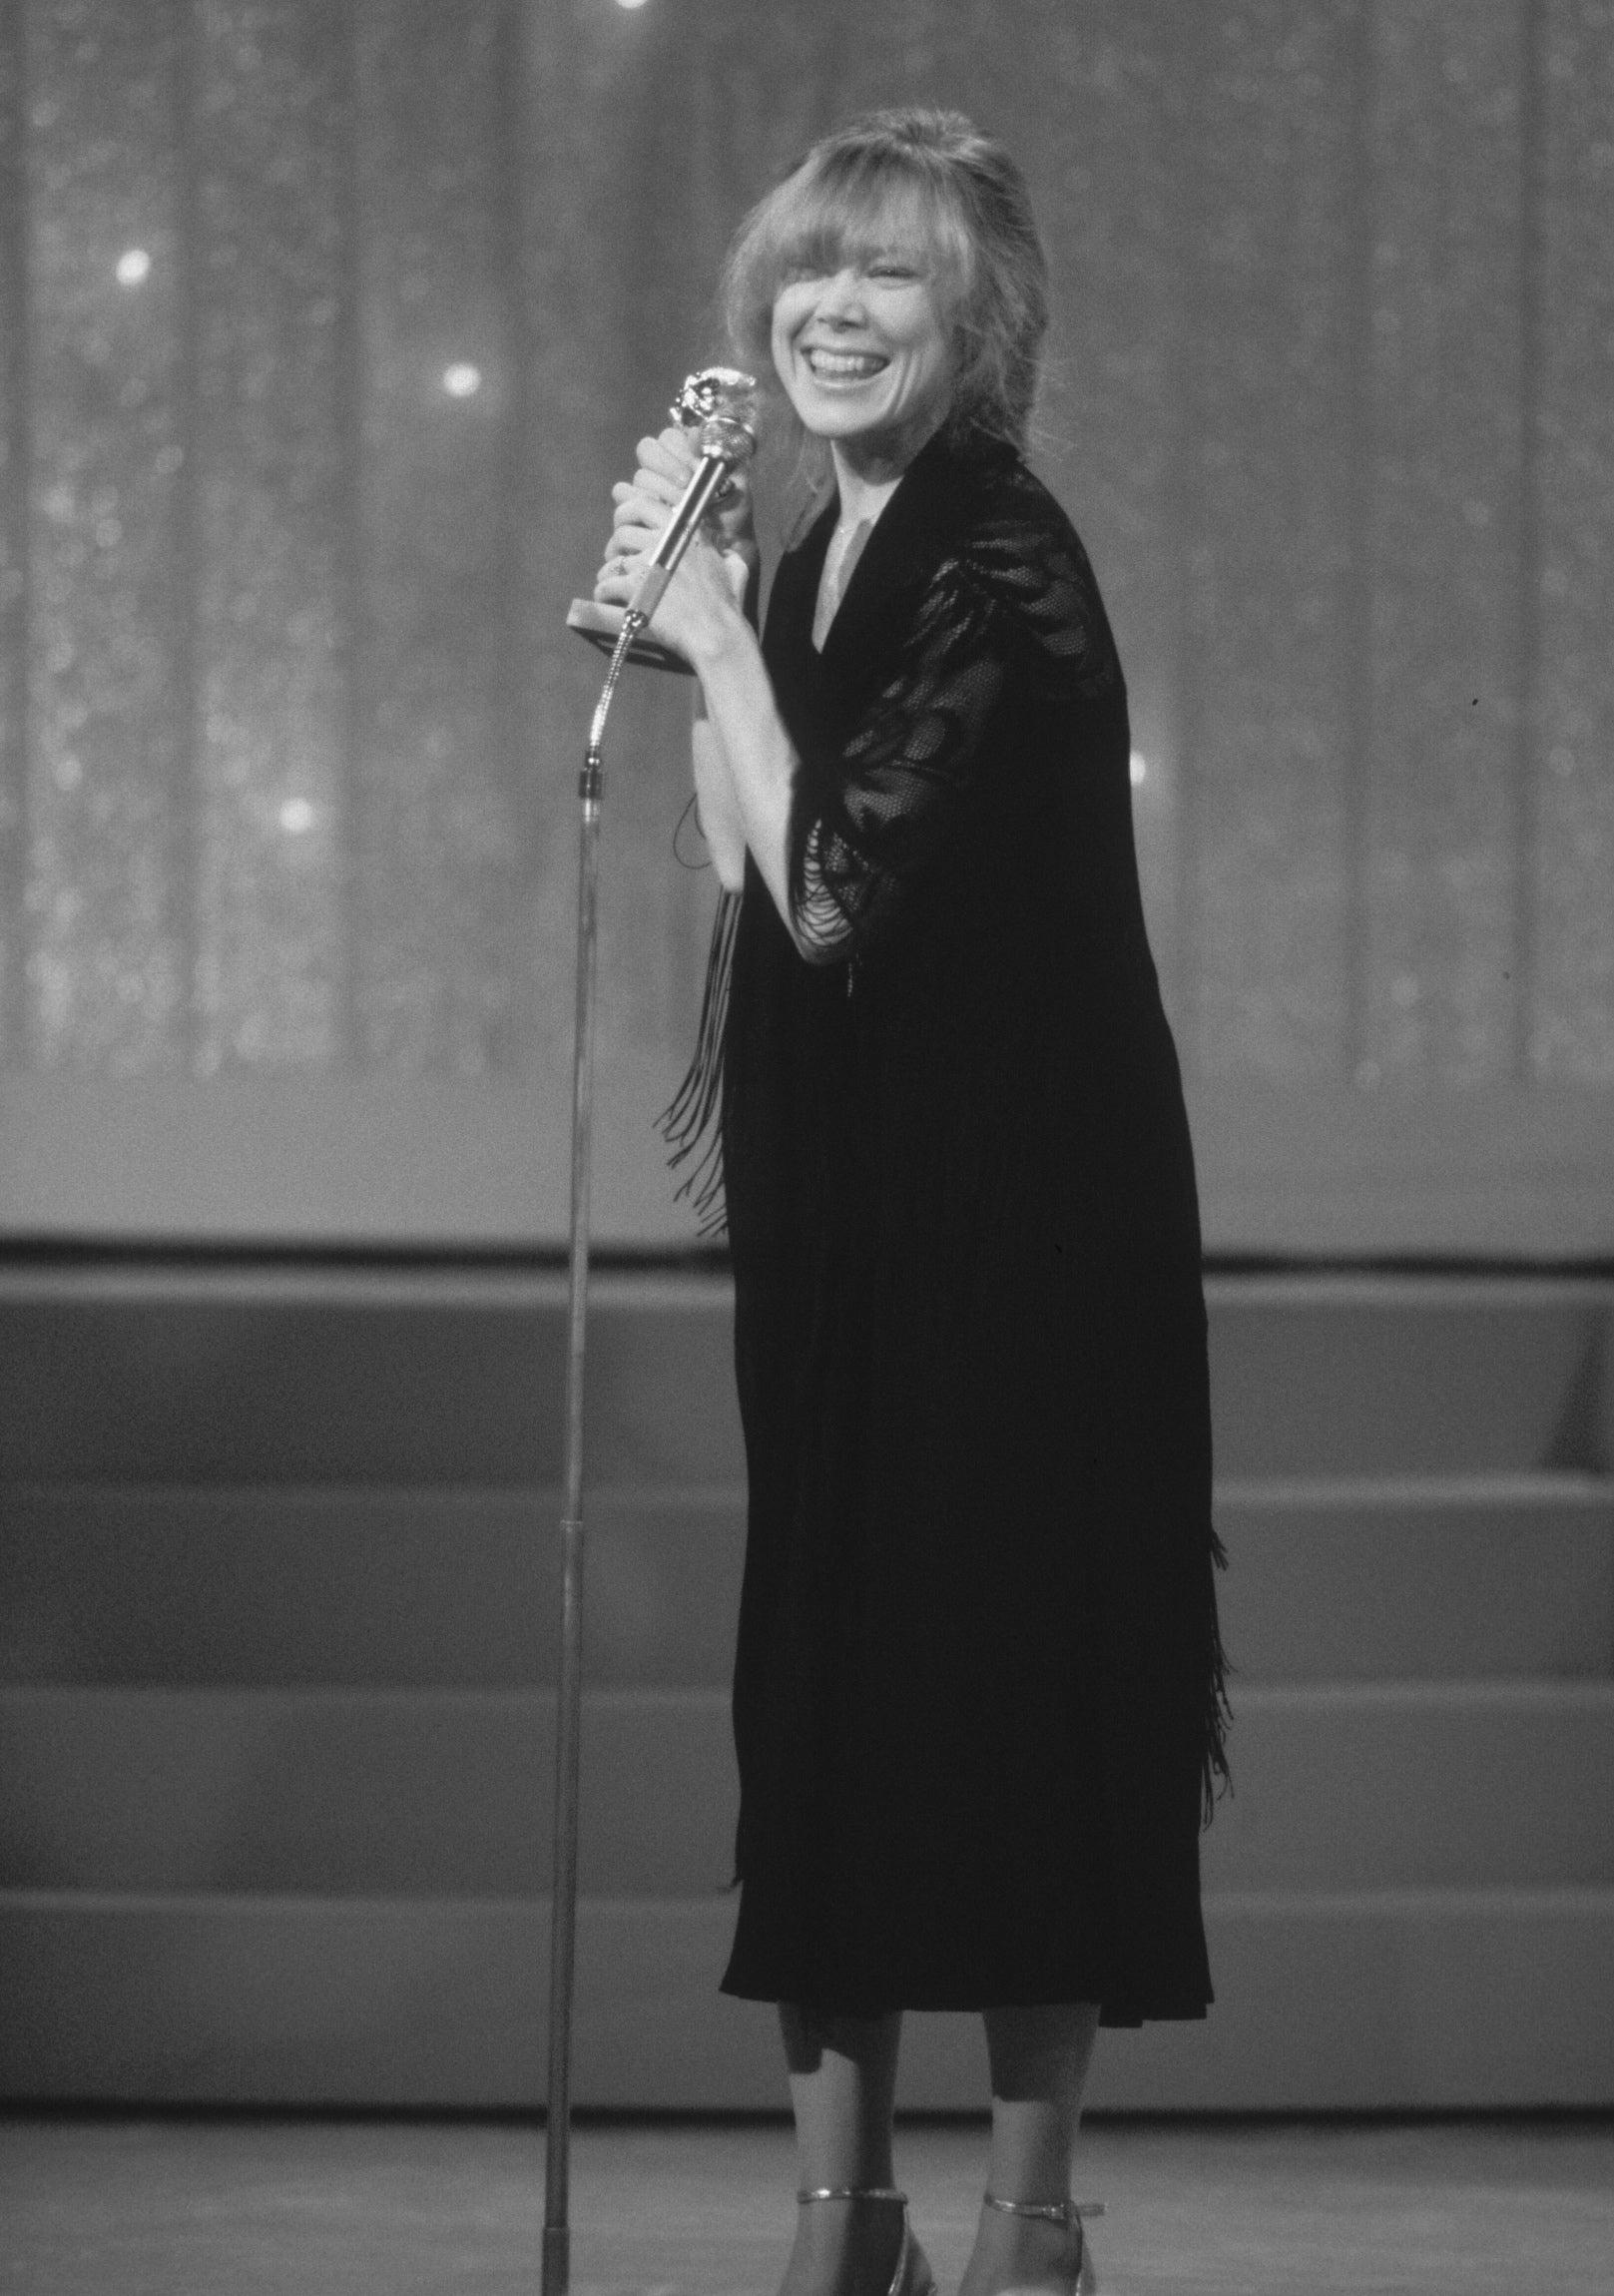 Sissy Spacek, Golden Globe winner, actress musical or comedy, 1981